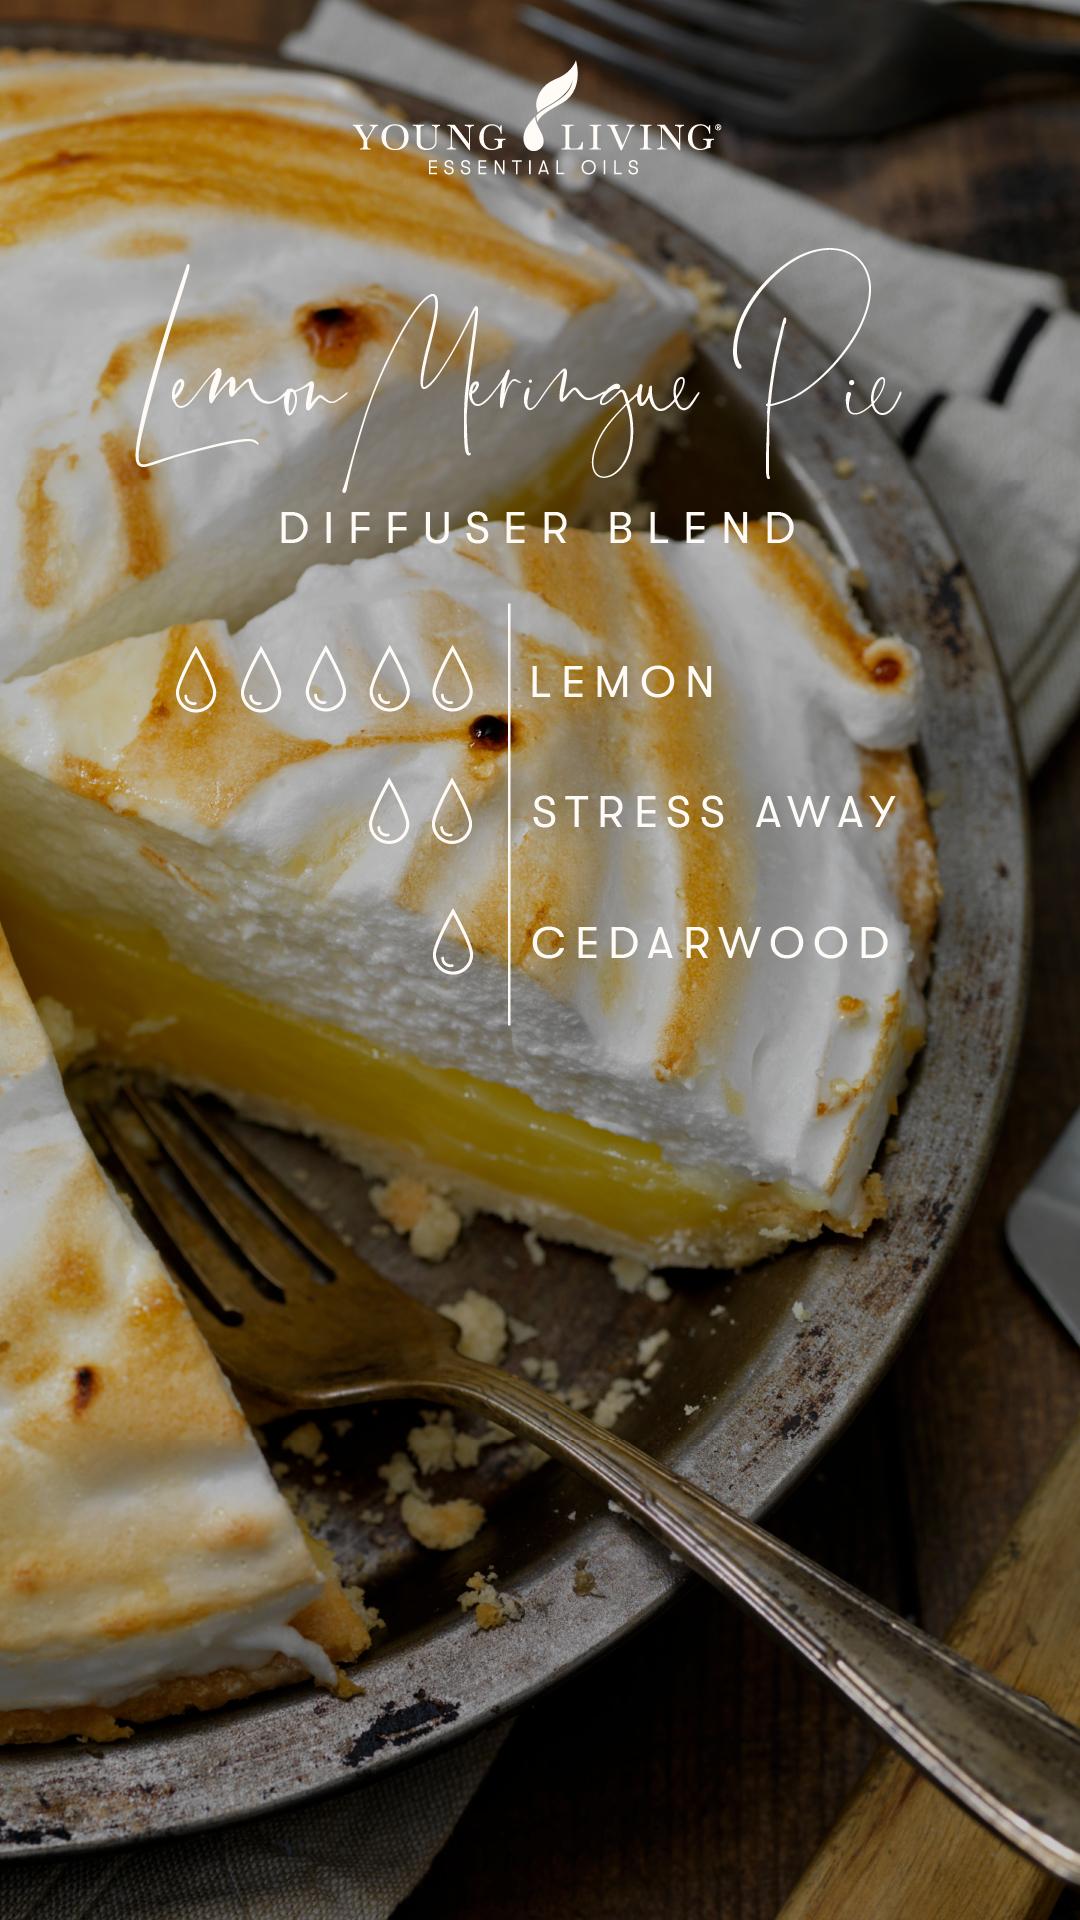 5 drops Lemon 2 drops Stress Away 1 drop Cedarwood